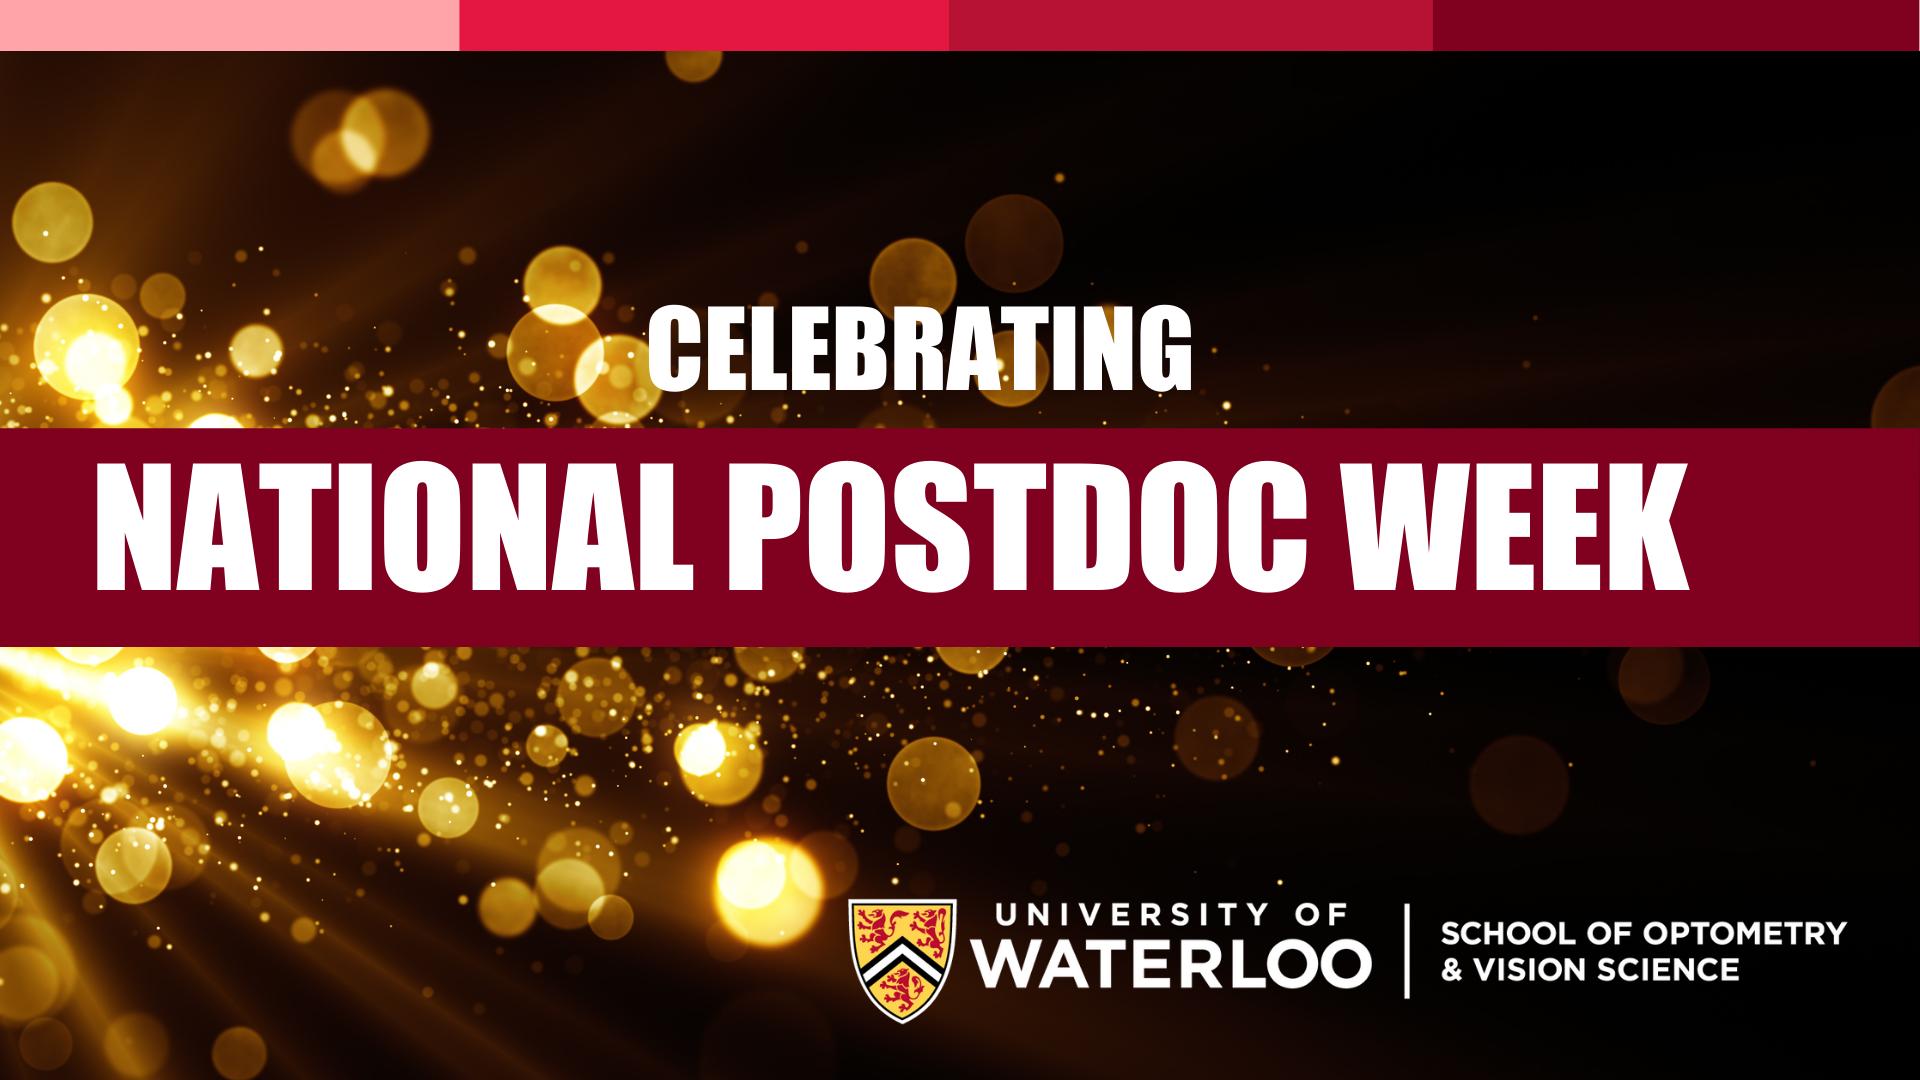 National Postdoc Week banner against a golden glitter background